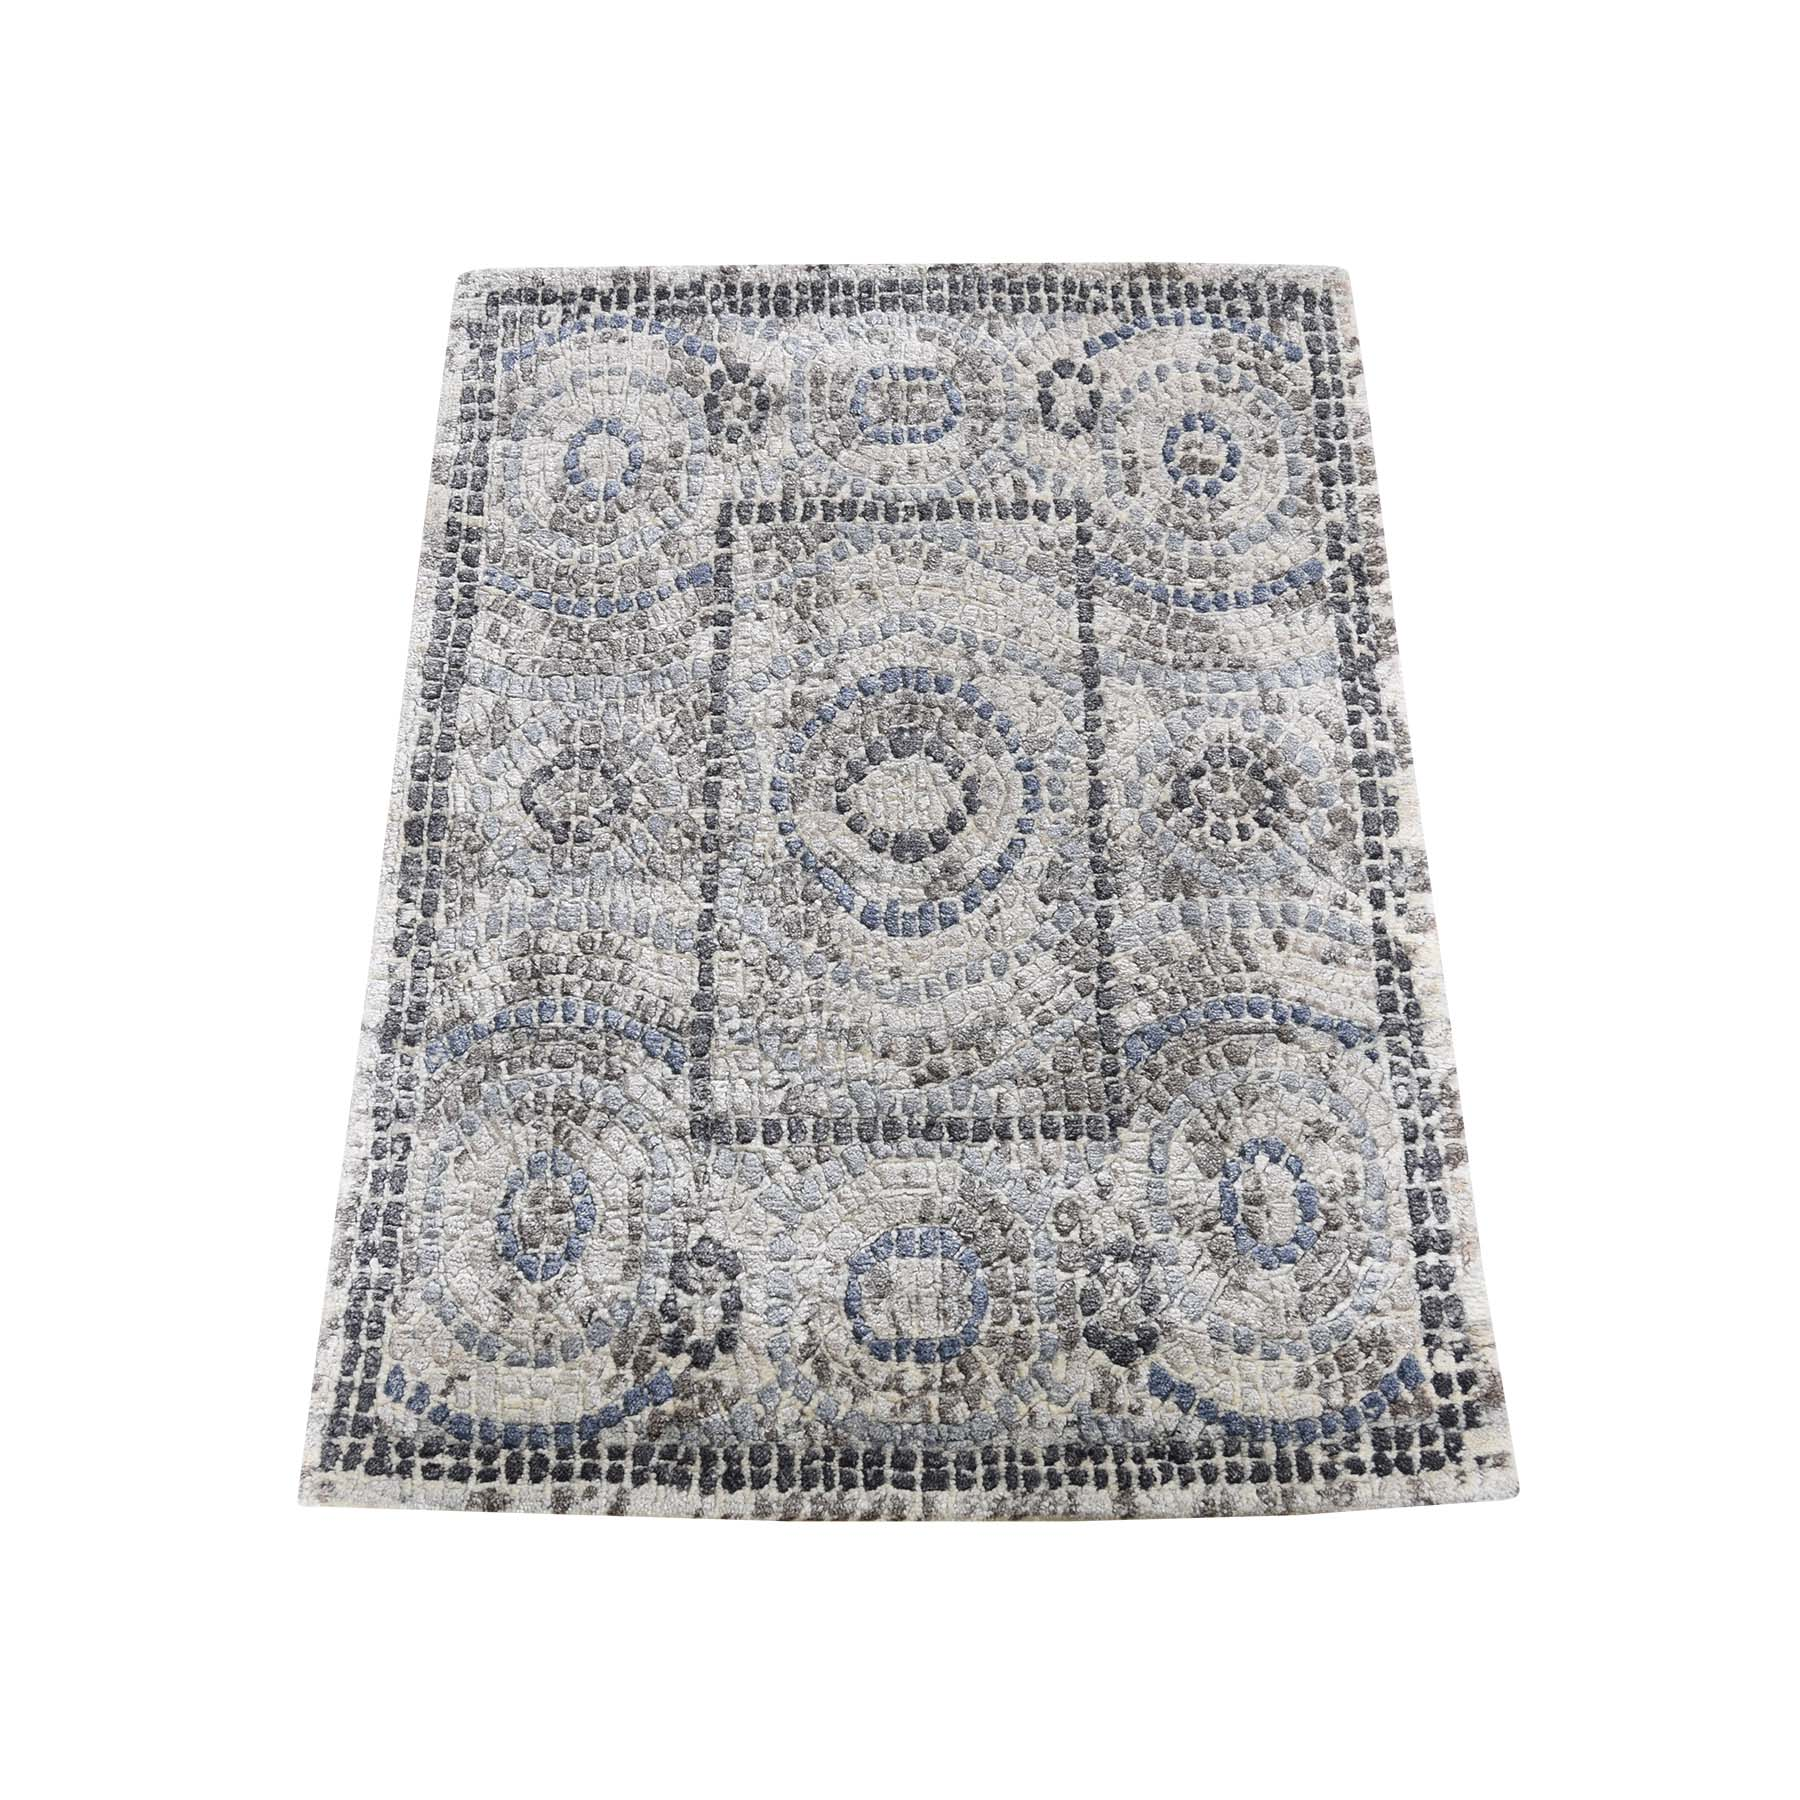 "2'2""x3' Blue Silken Roman Mosaic Design Hand-Knotted Oriental Rug"